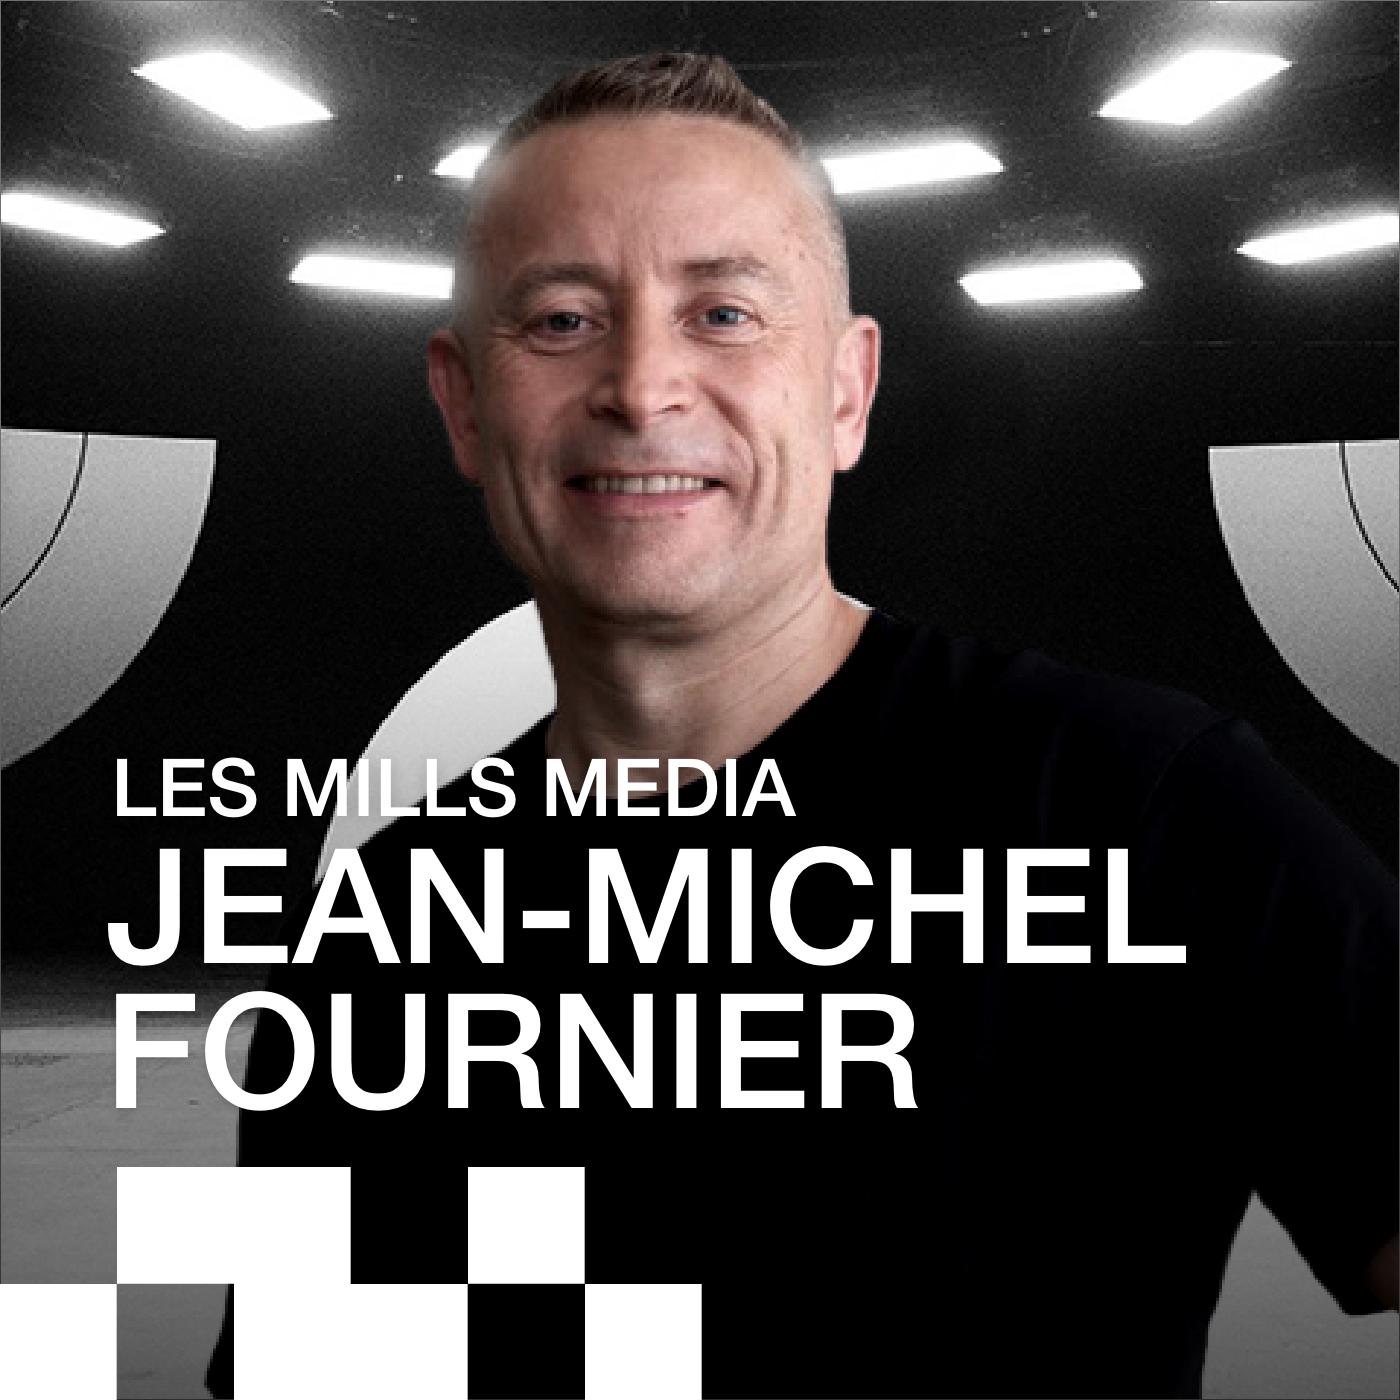 Jean-Michel Fournier